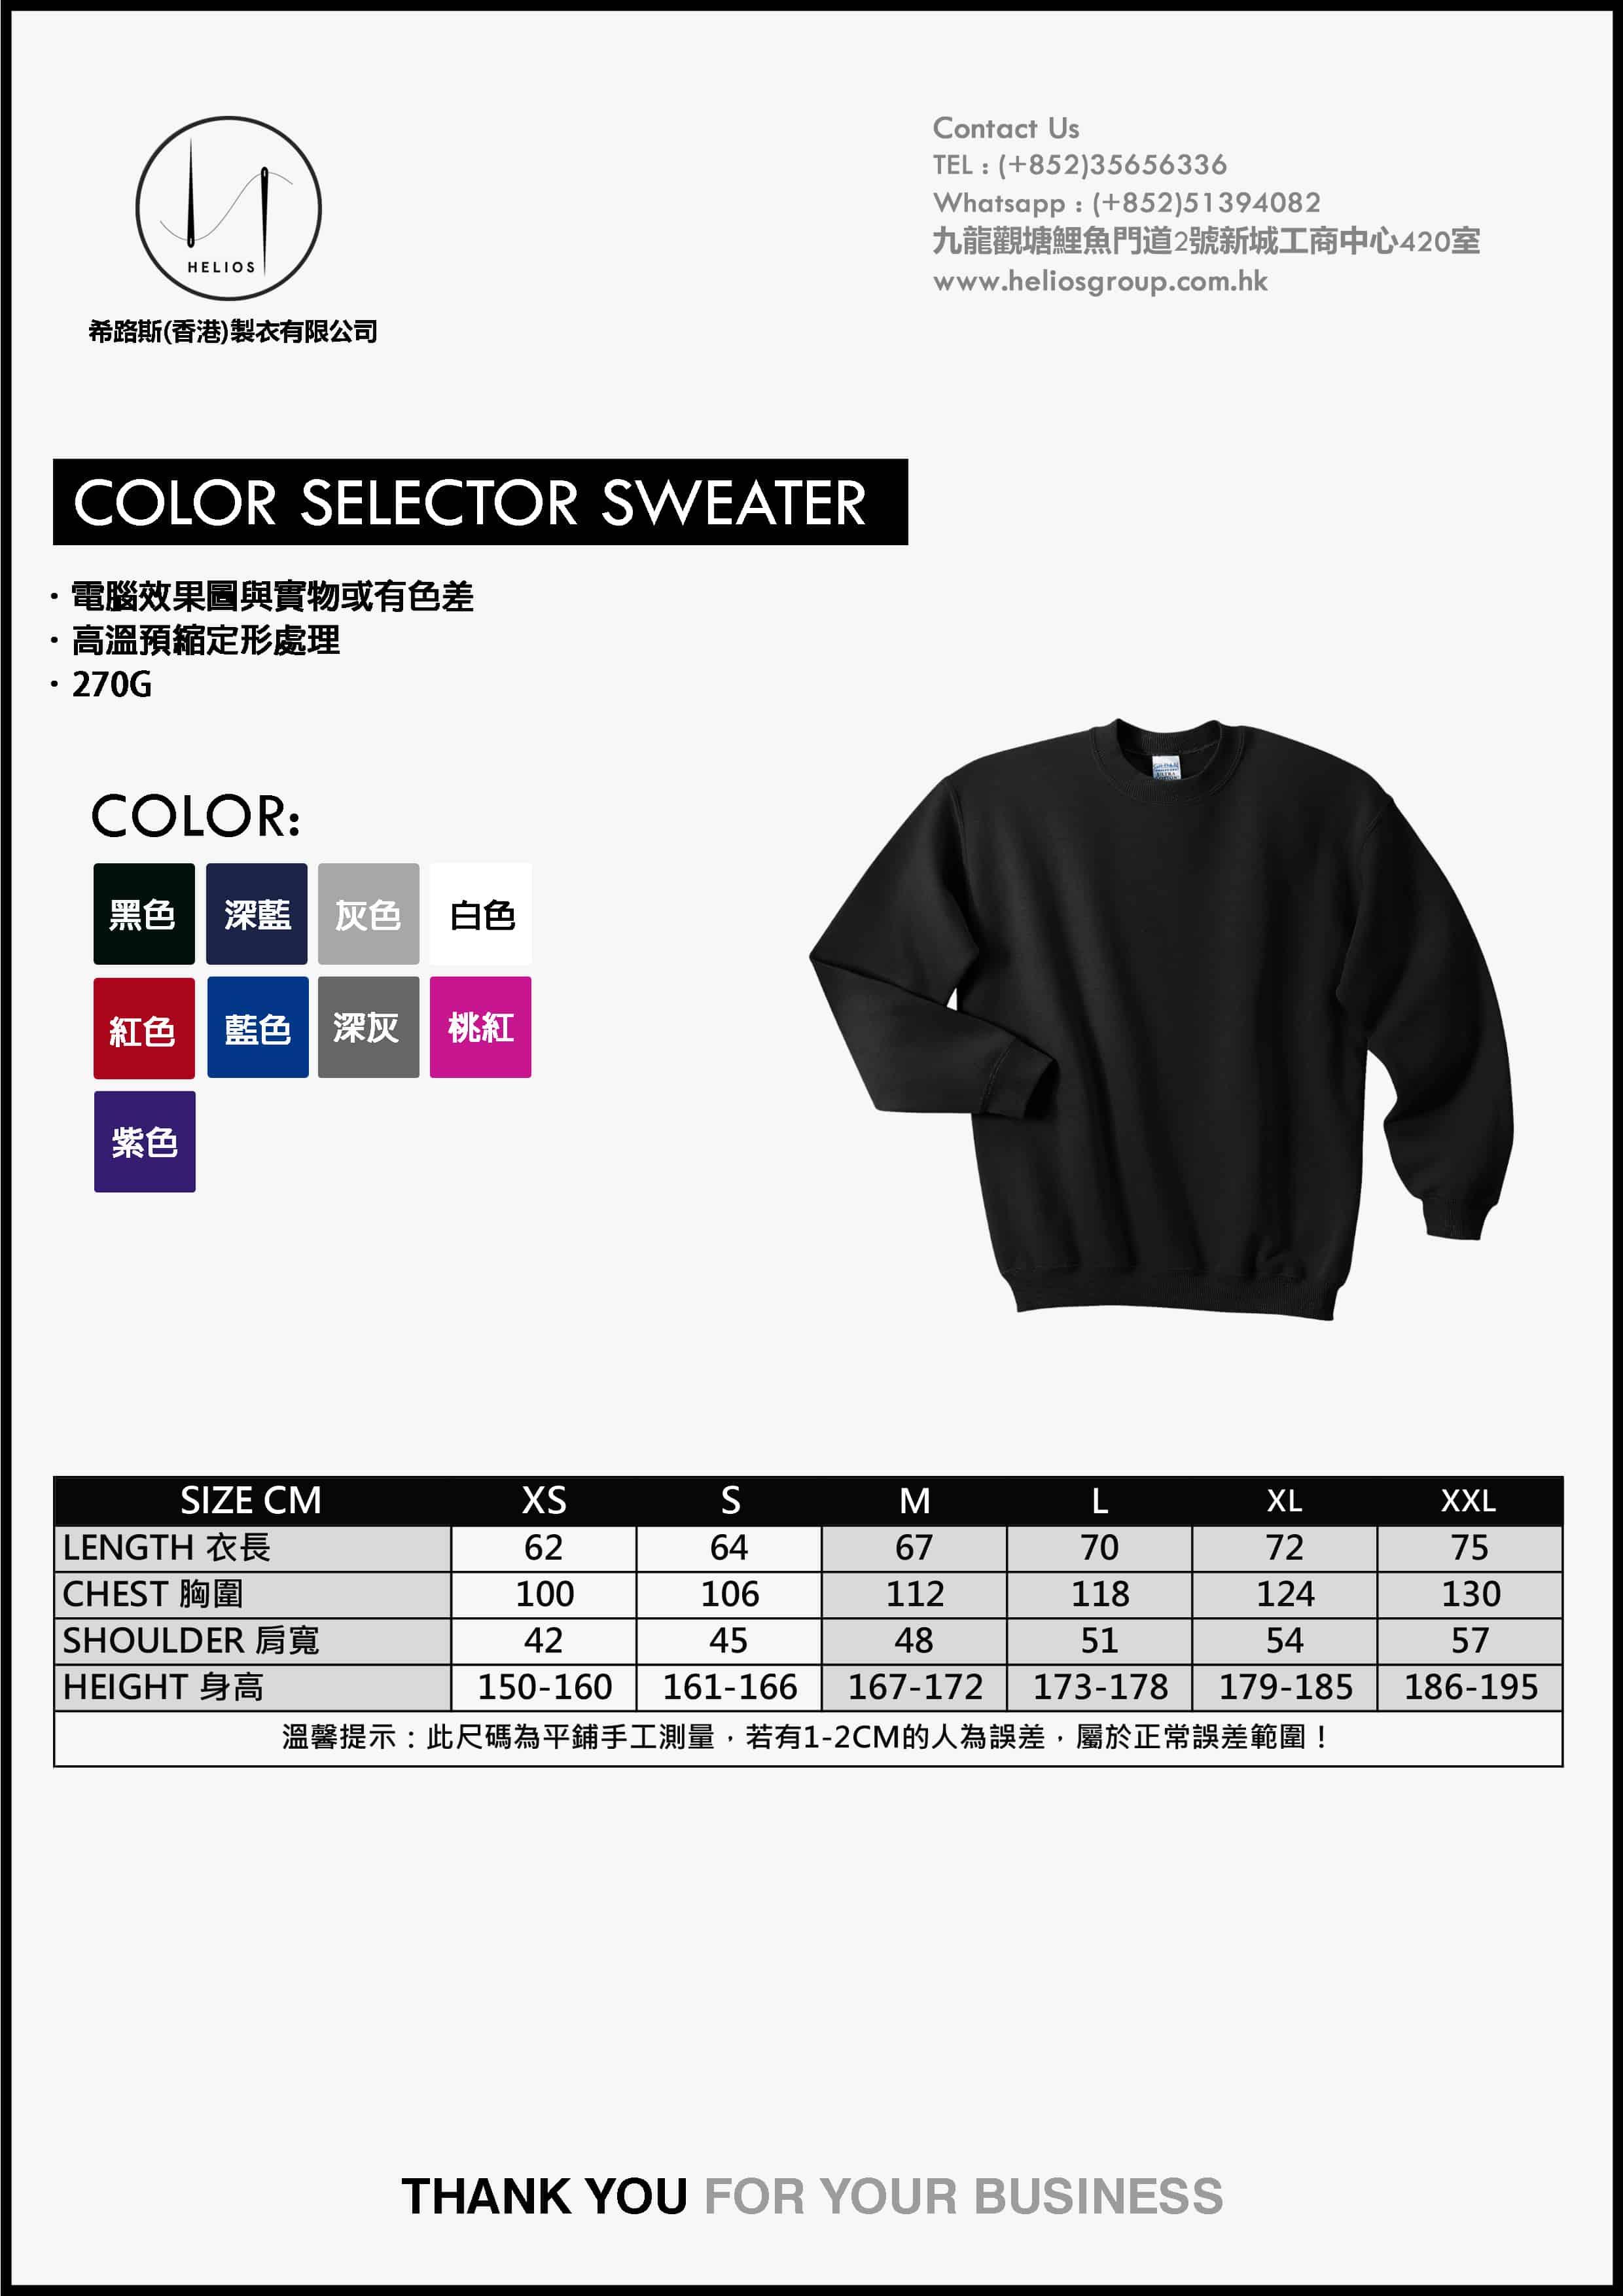 gildan sweater尺碼表